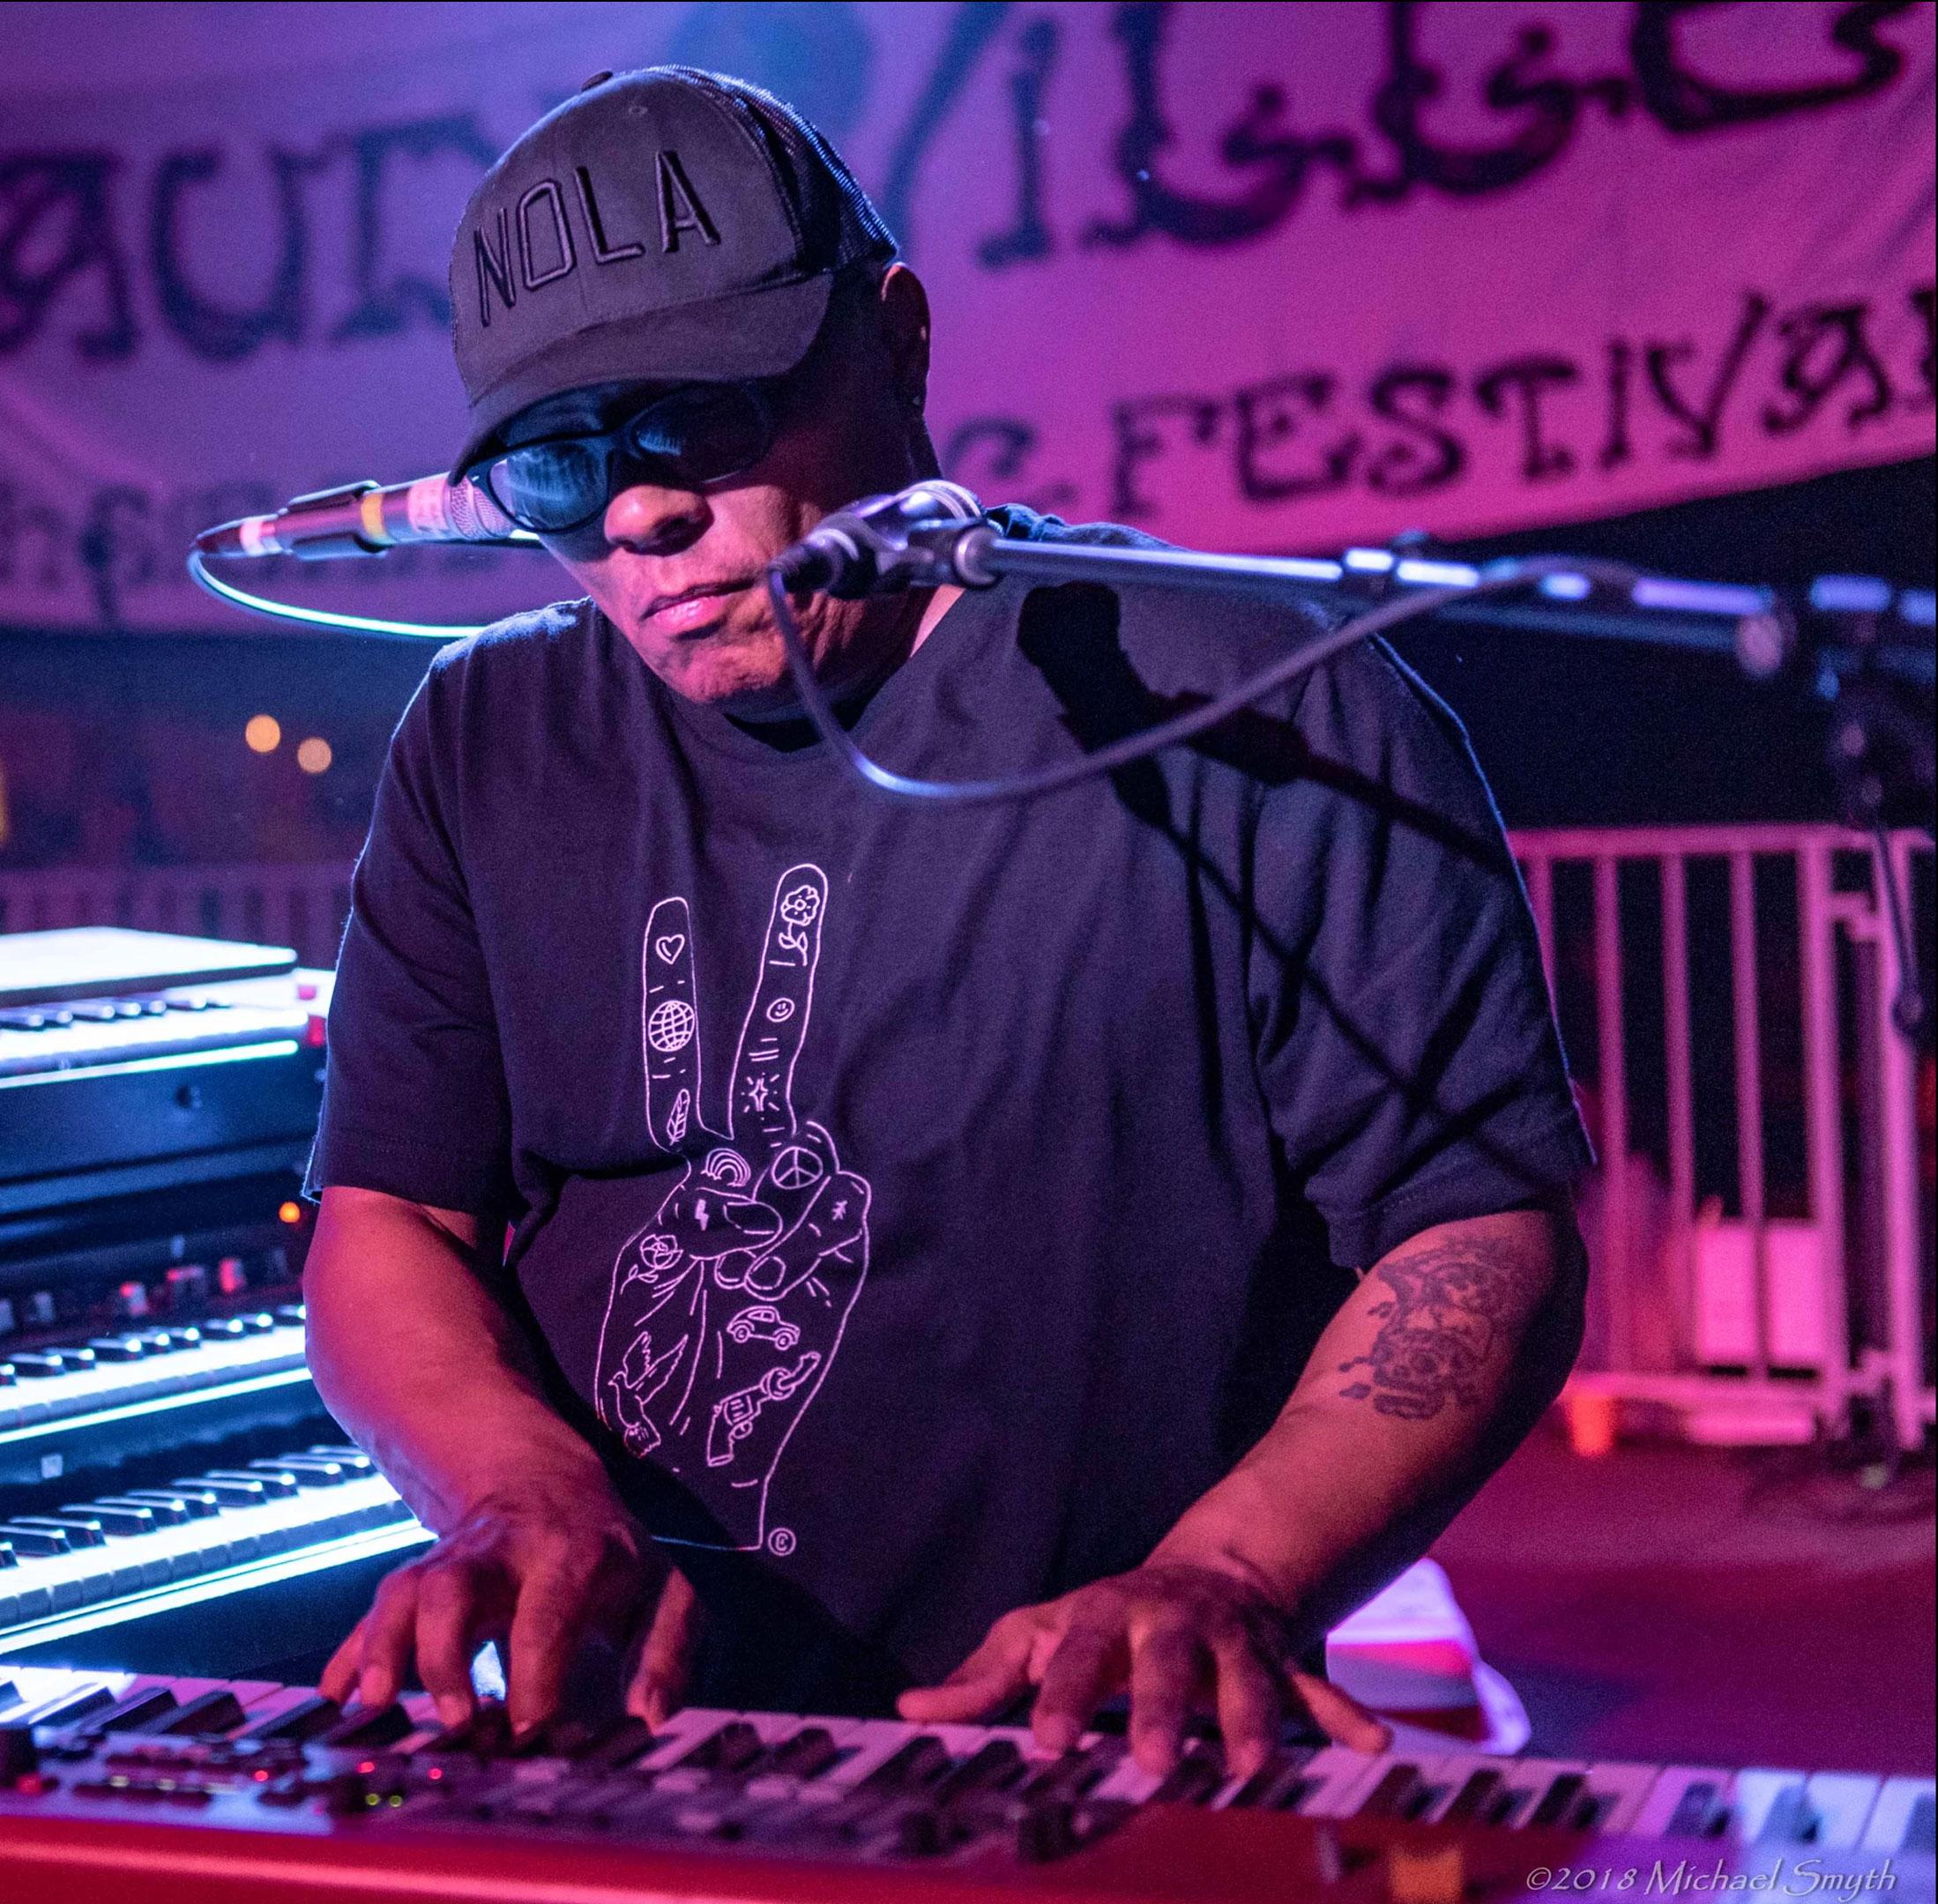 drummer-zigaboo-modeliste-Foundation-of-Funk_04